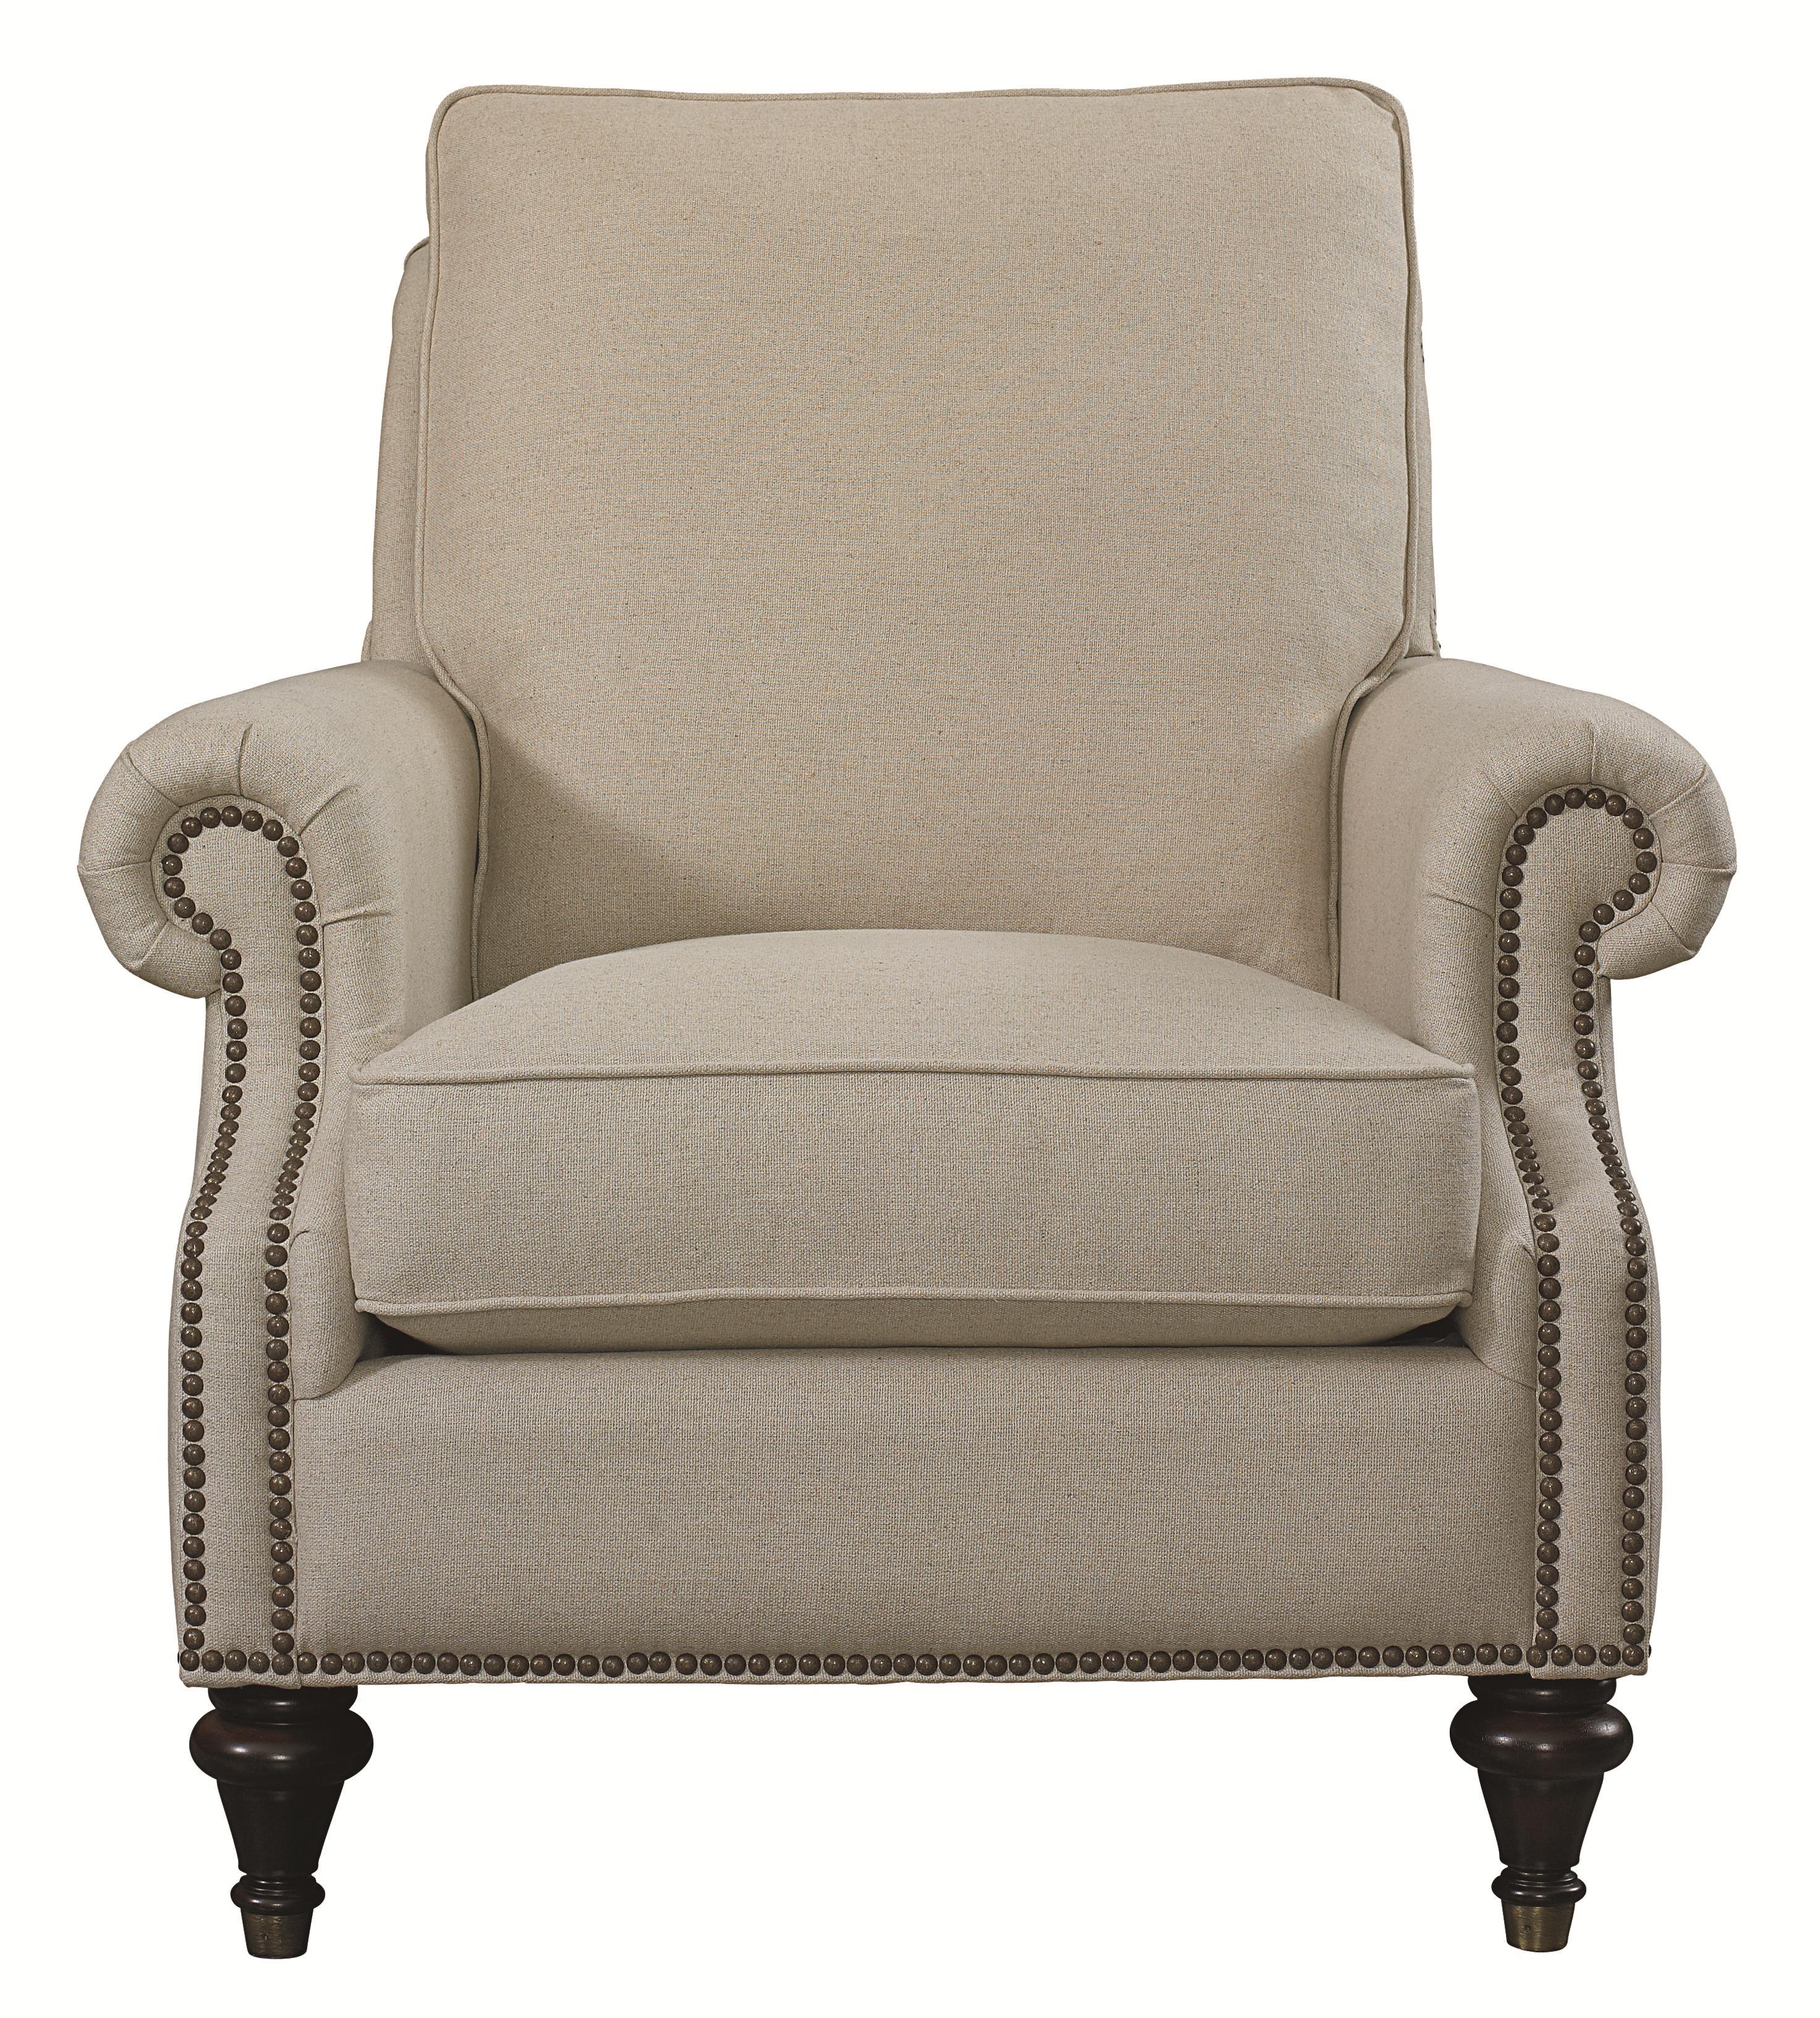 Bassett Accent Chairs By Bassett 1494 02 Oxford Accent